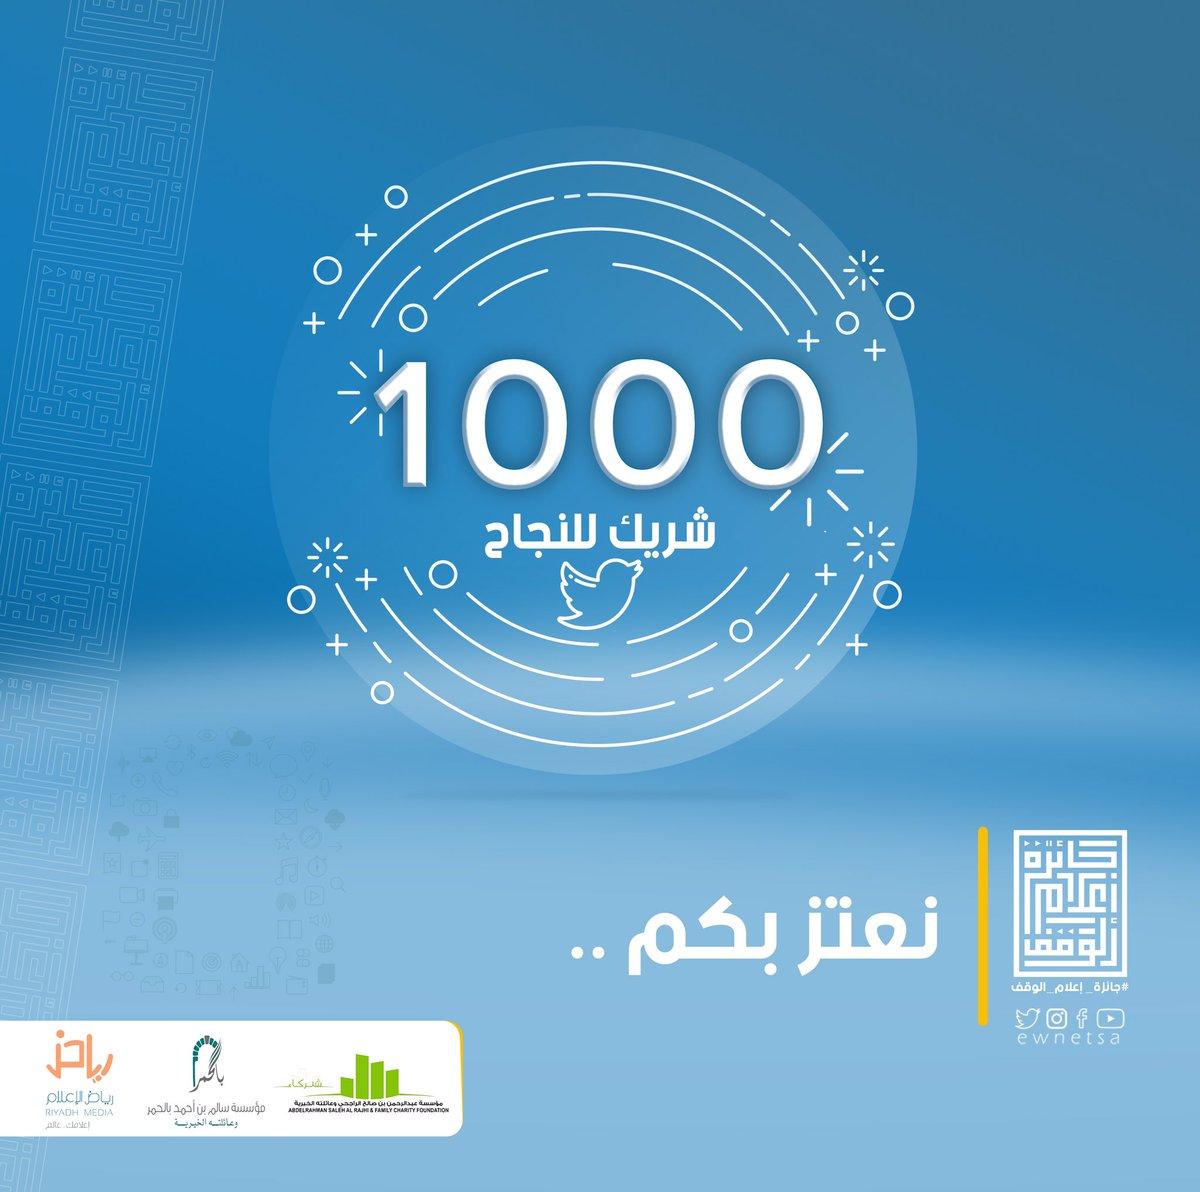 RT @ewnetsa: 1000 شريك لنا عبر حسابنا على #تويتر تعتز بكم #جائزة_إعلام_الوقف  📱🎉 https://t.co/BNqBbWFKDW https://t.co/az1A8HXJc6